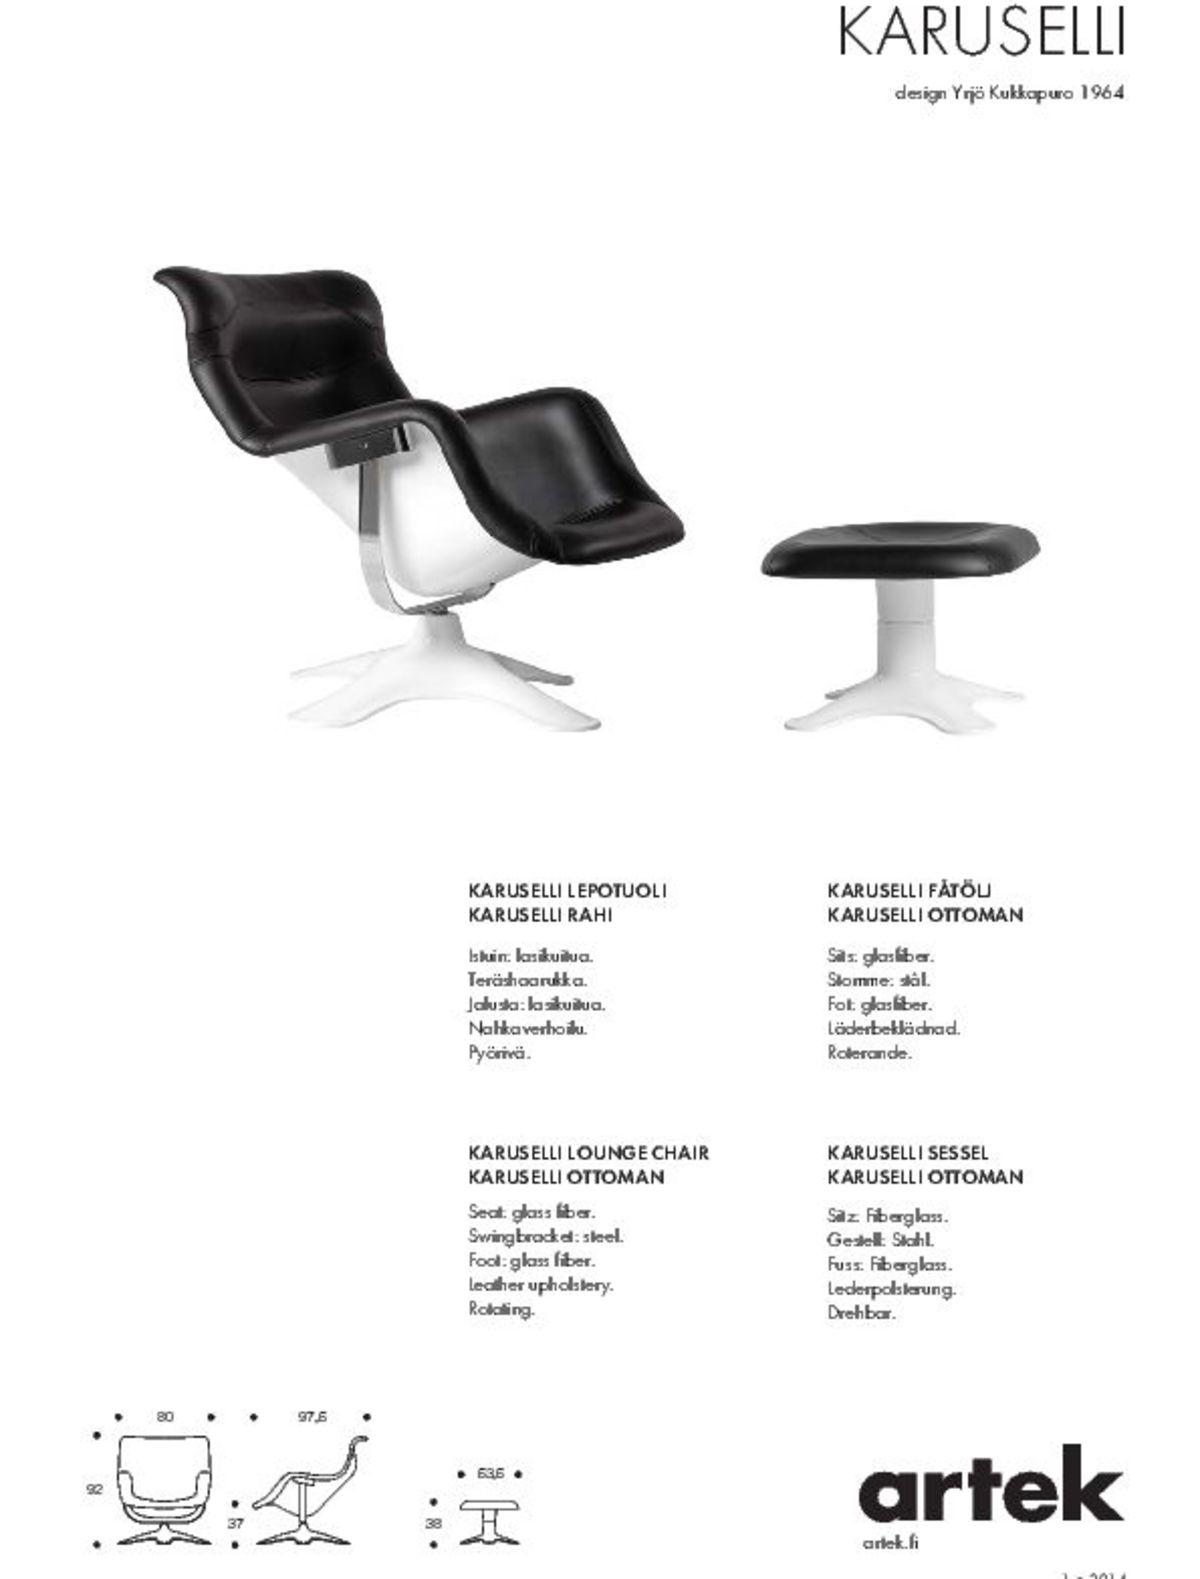 Karuselli Lounge Chair Factsheet